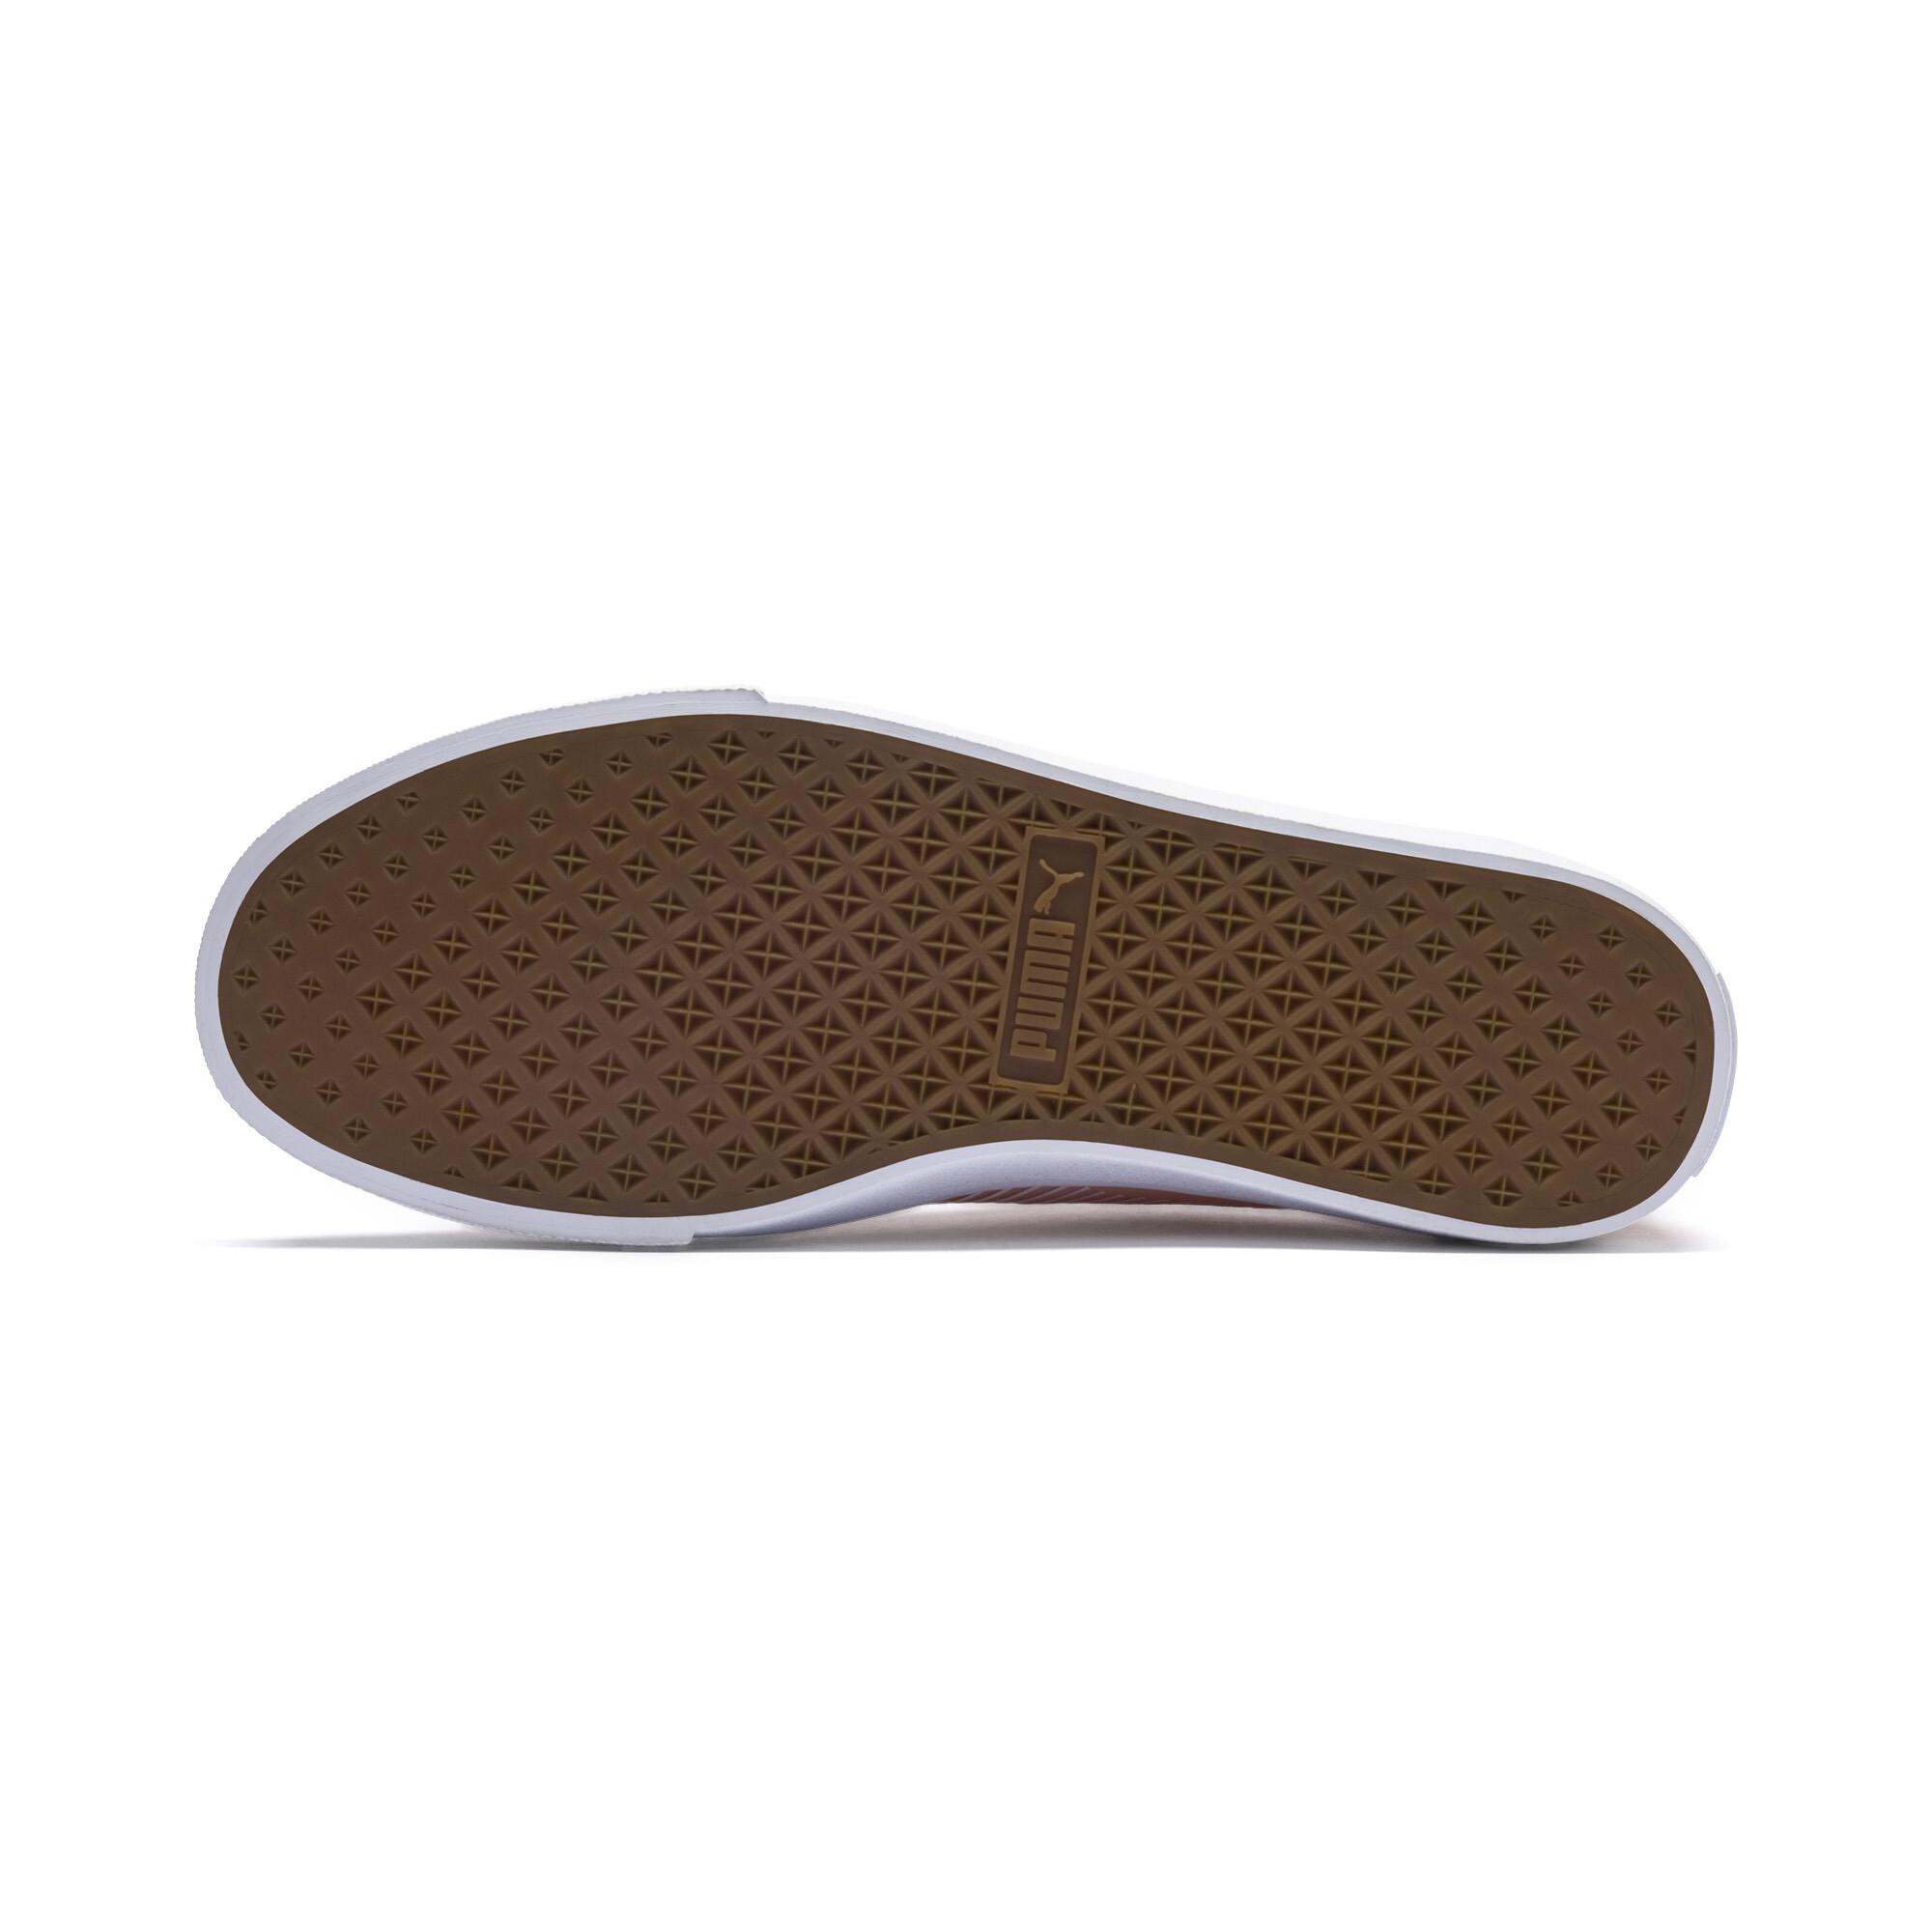 PUMA-Bari-Sneakers-Men-Shoe-Basics thumbnail 24